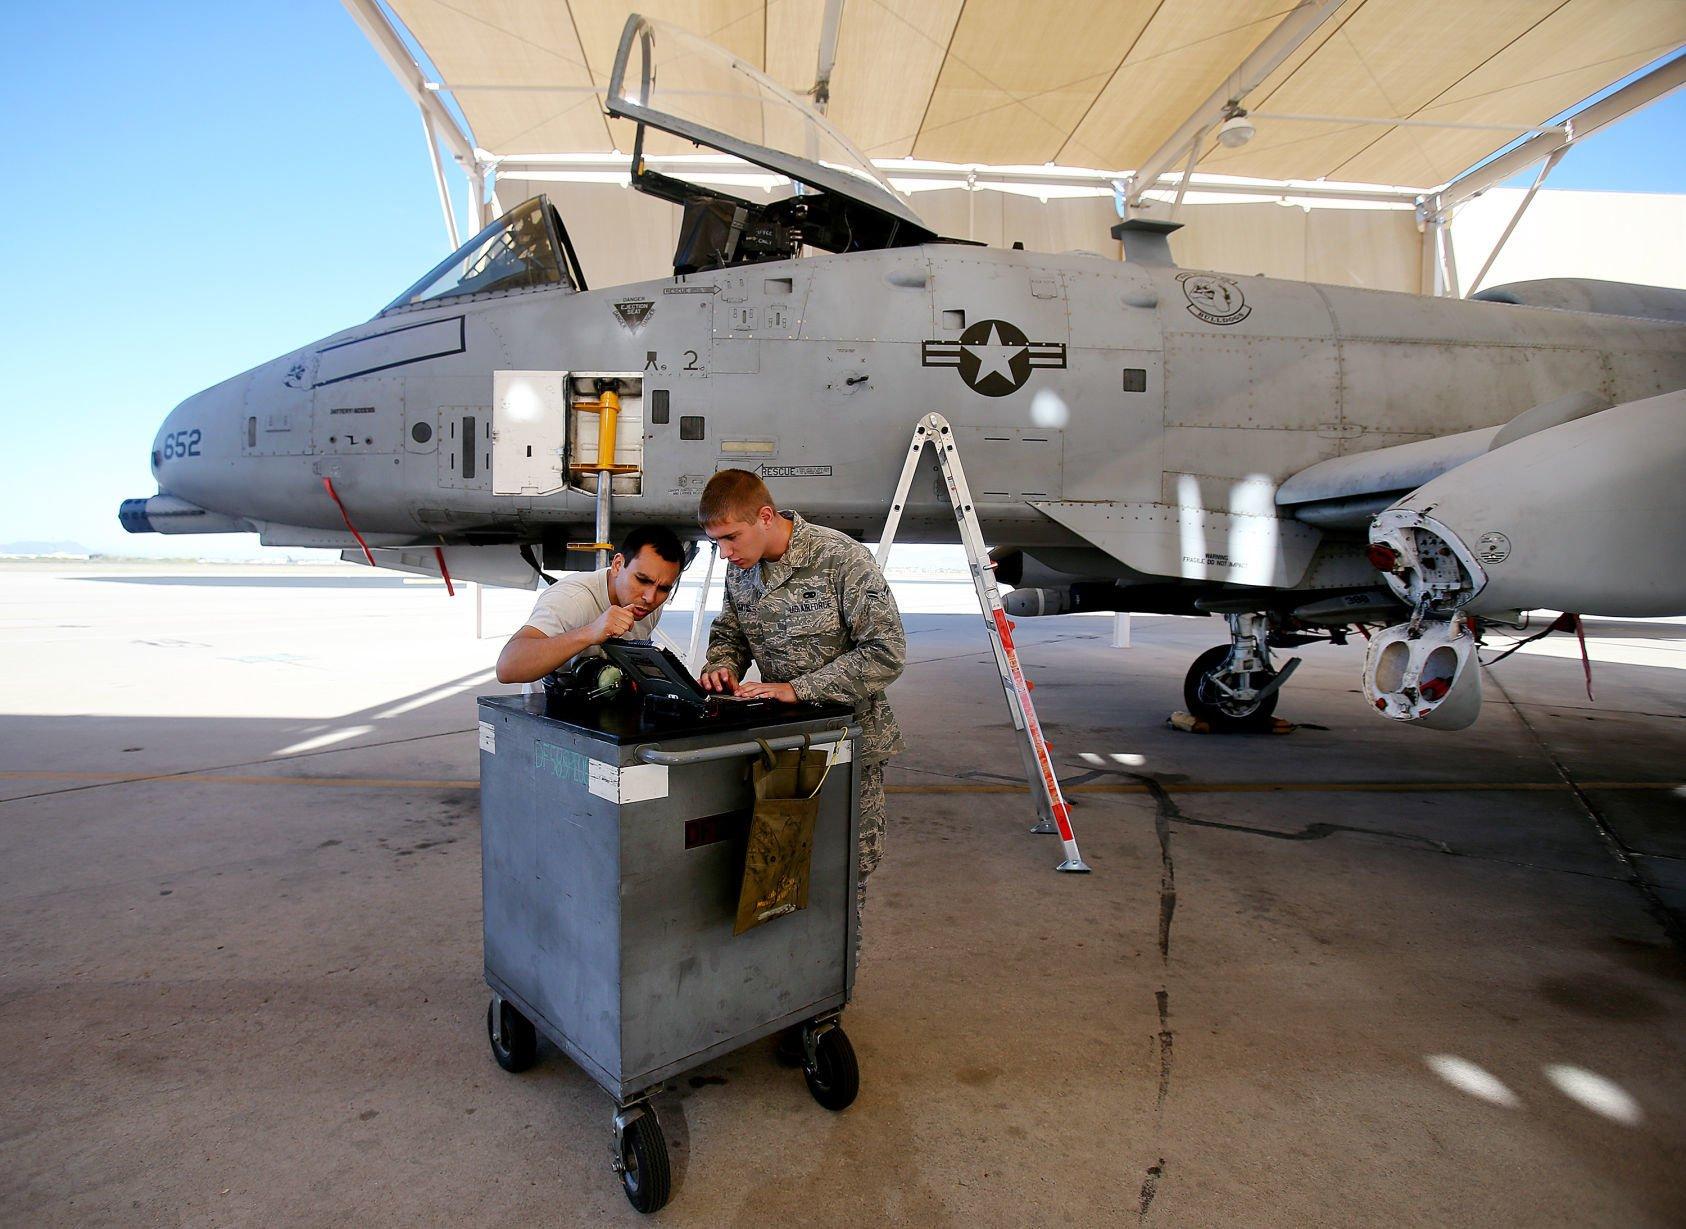 Defense bill will extend life of A-10, boost Raytheon programs | Tucson.com